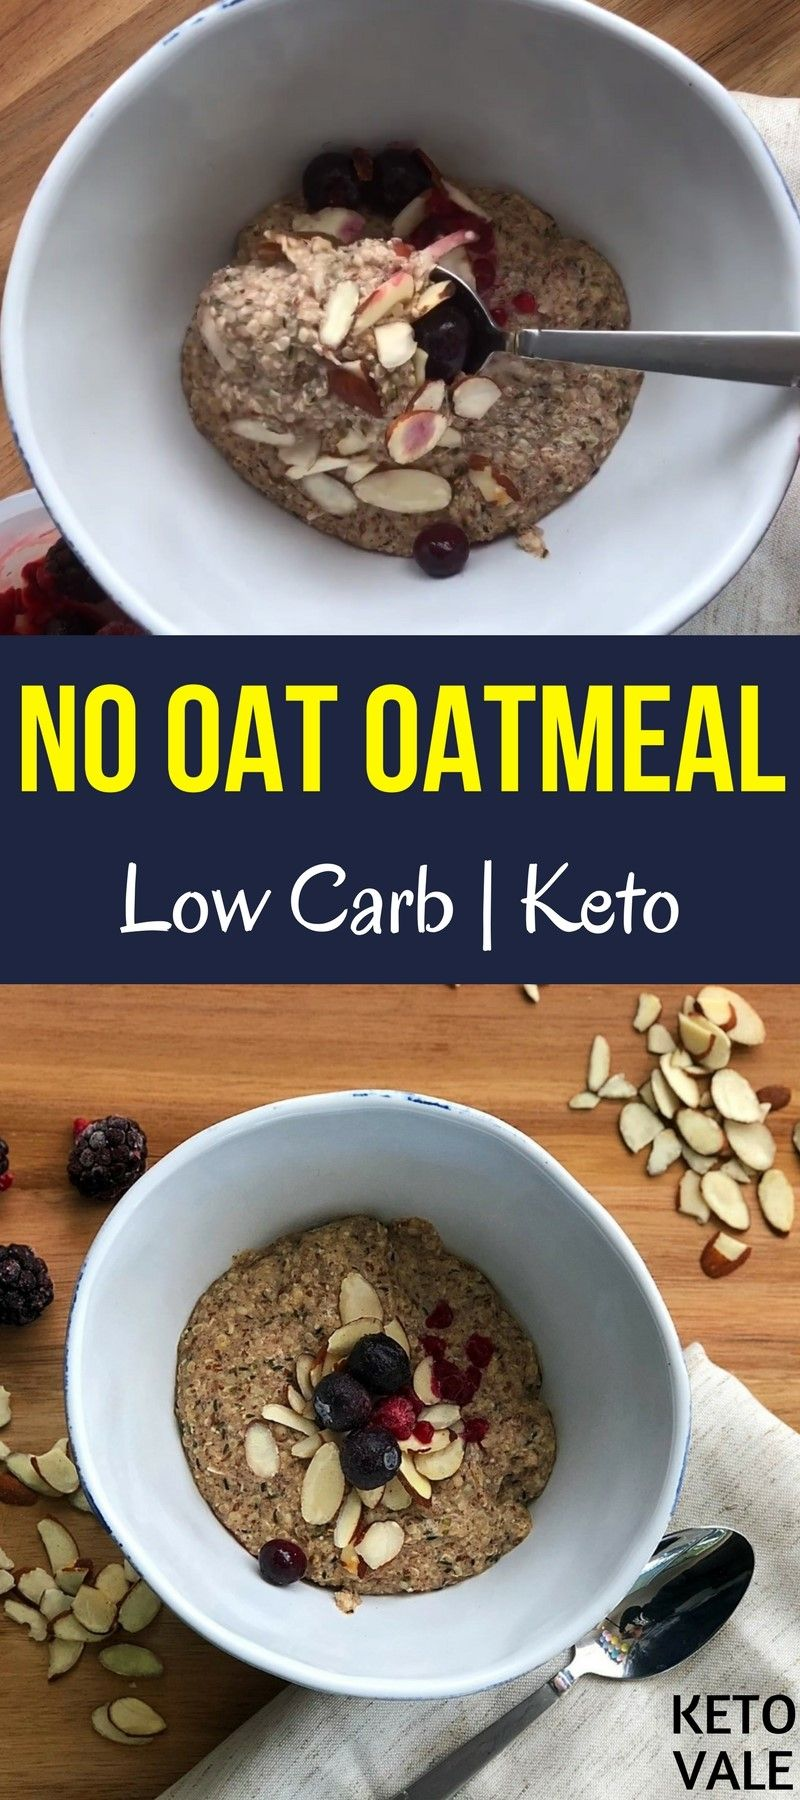 Low Carb Keto No Oats Oatmeal recipe with Flaxseed meal, Almond Milk, Hemp Hearts, Chia Seeds, MCT Oil #flaxseedmealrecipes